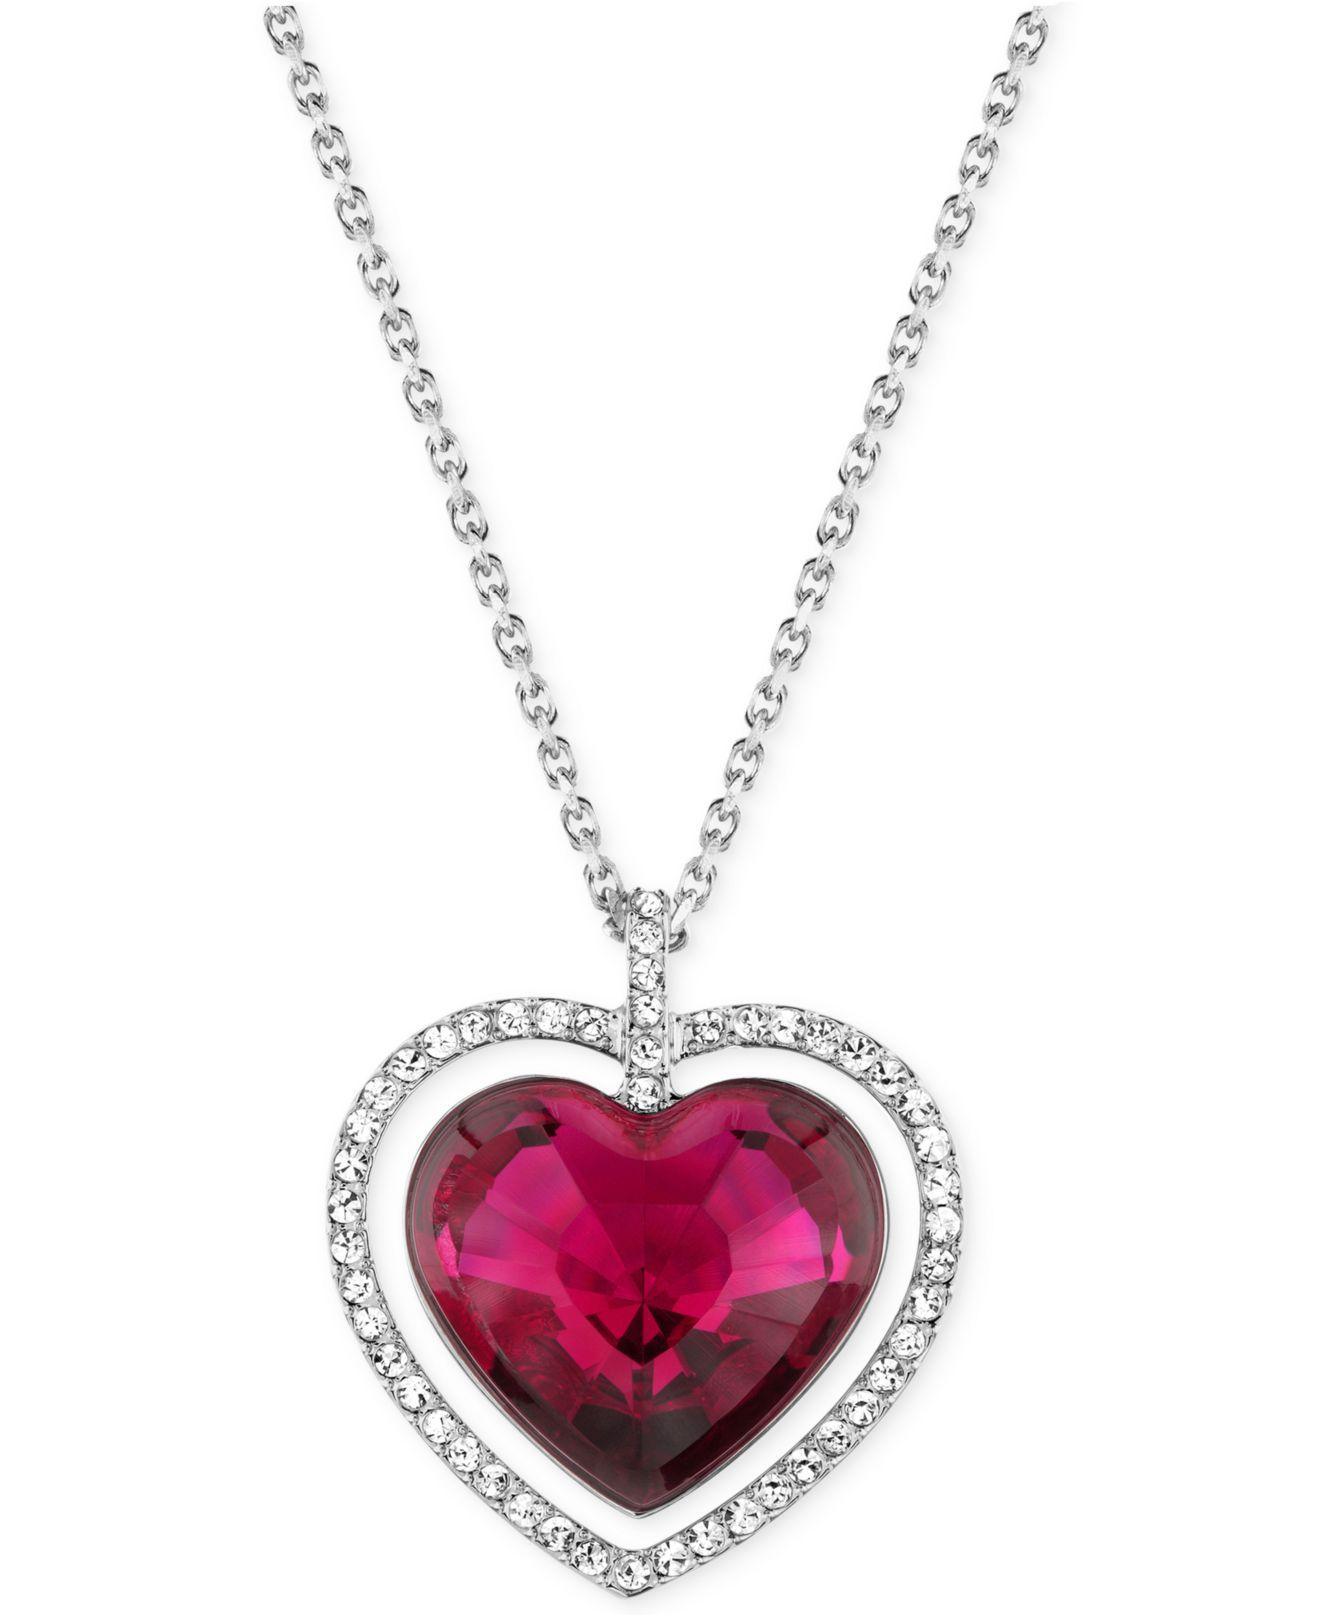 swarovski rhodium plated red crystal heart pendant. Black Bedroom Furniture Sets. Home Design Ideas